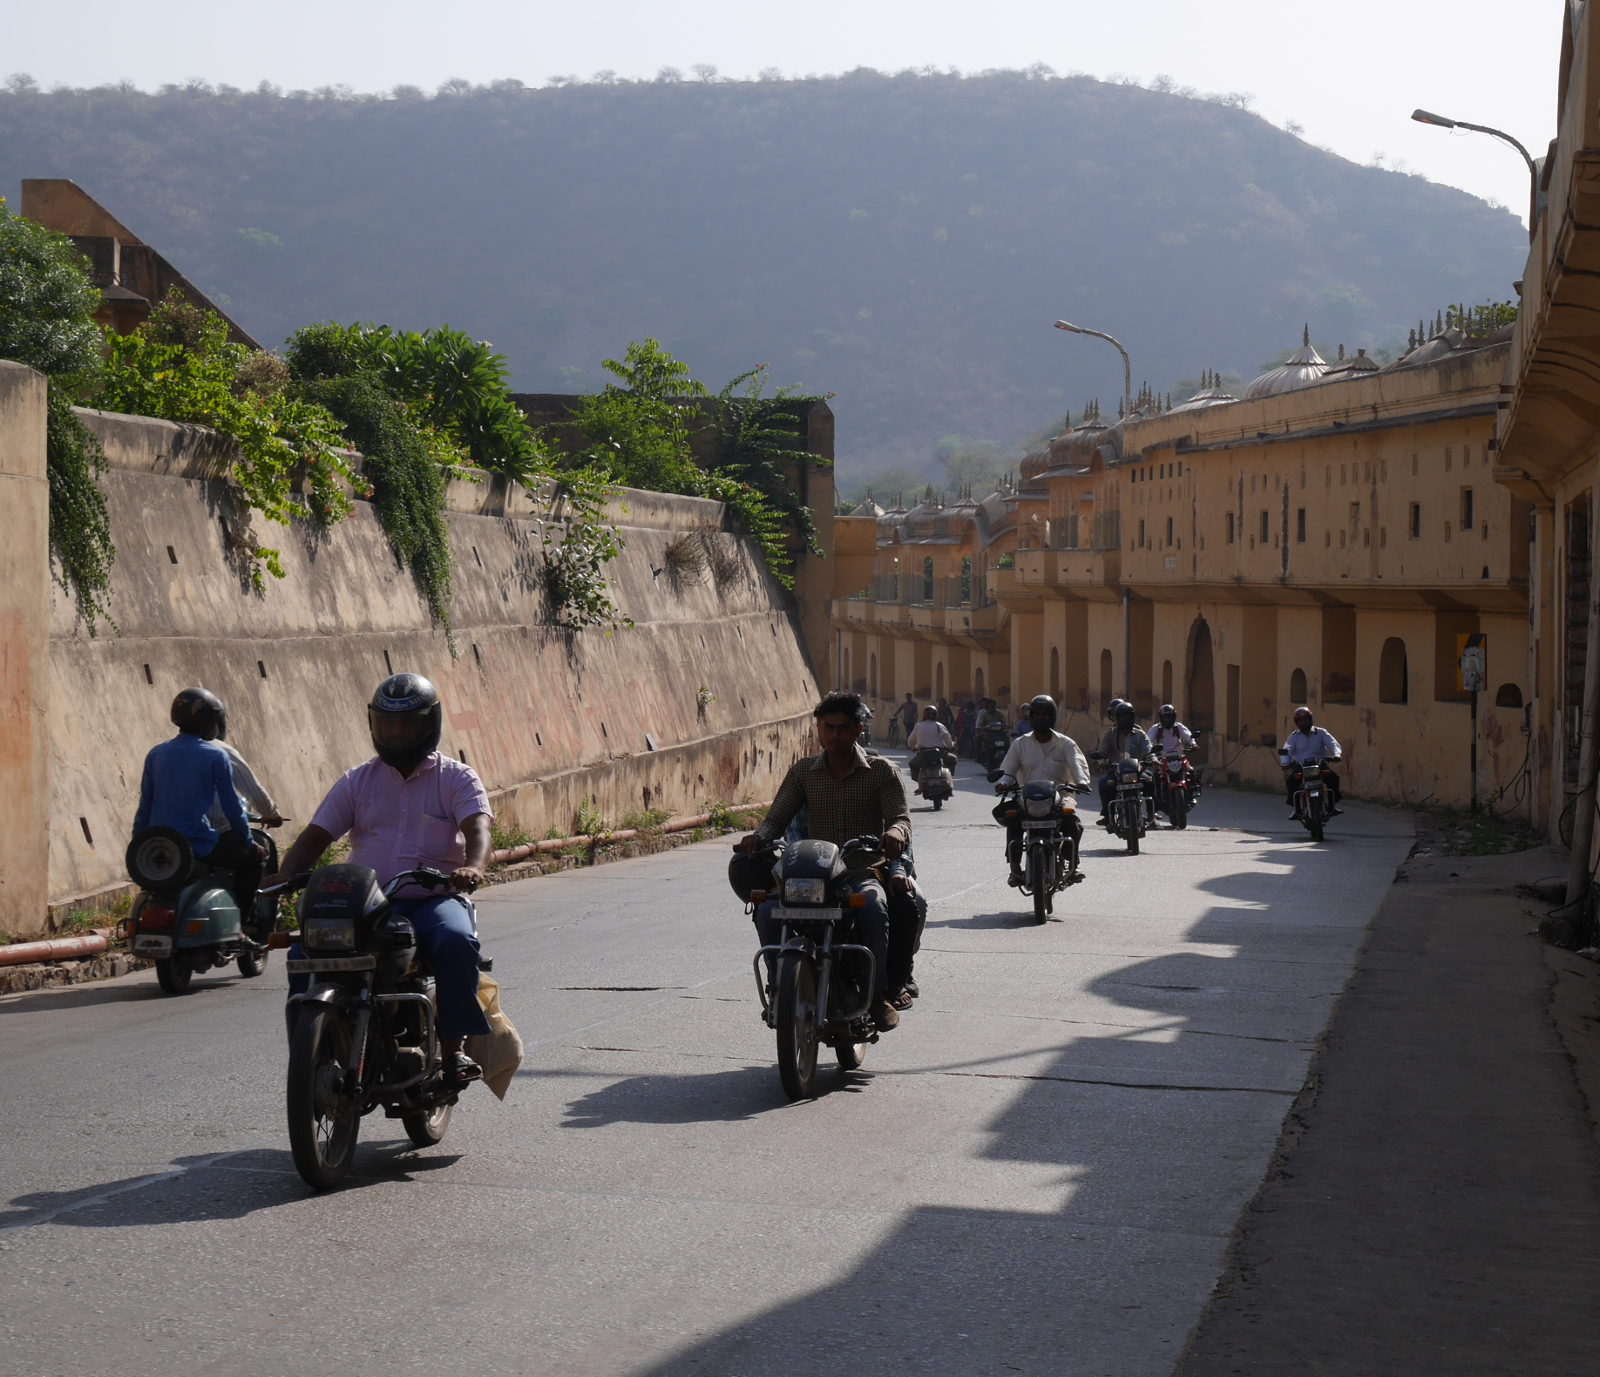 Motorcycles in the Ghat ki Gooni, Jaipur.